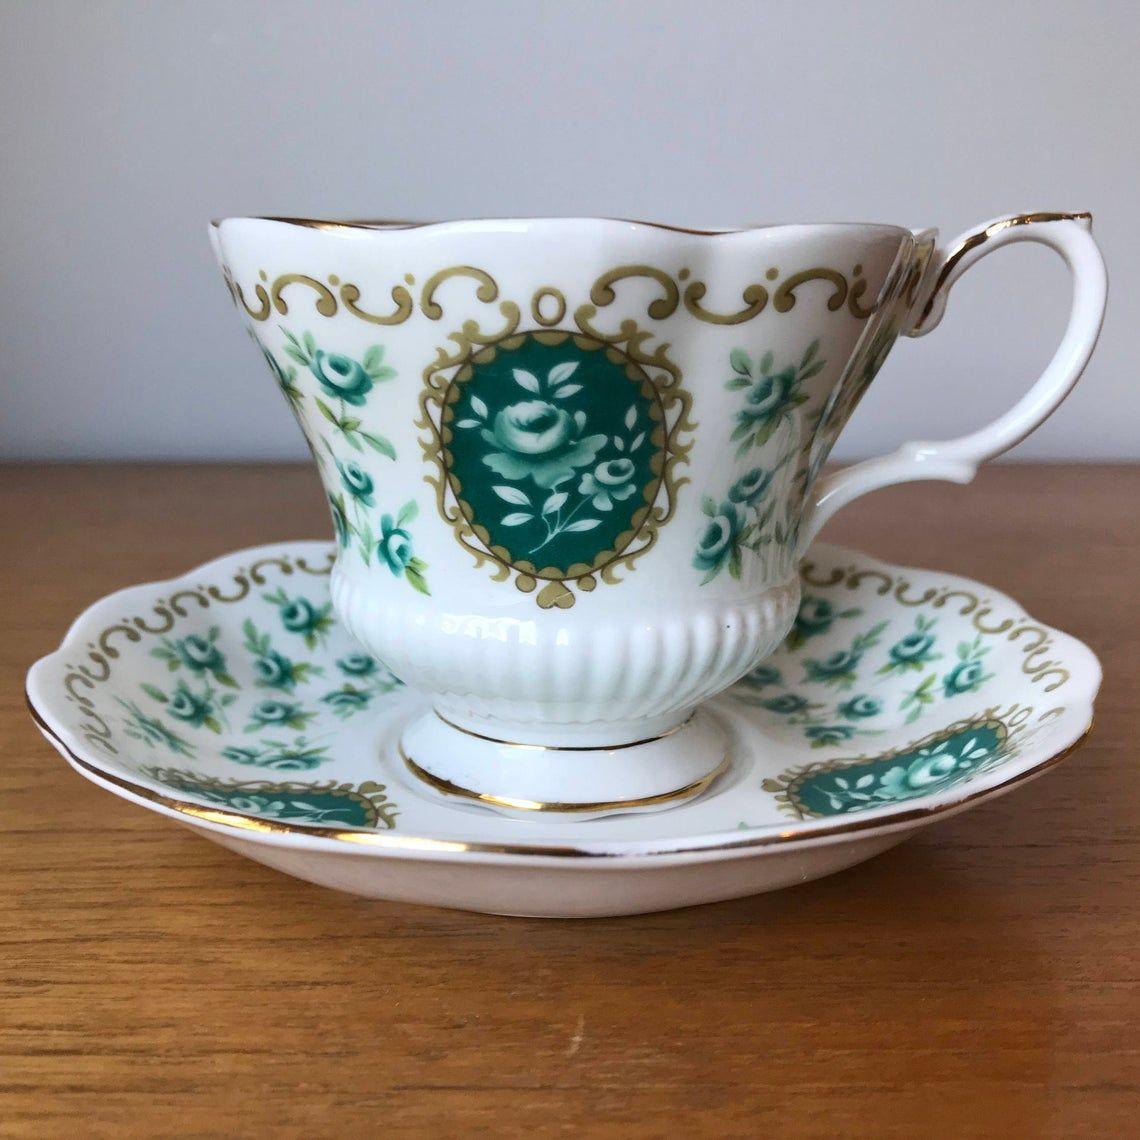 Royal Albert Roses Memento Cameo Series Teacup and Saucer, Green Floral Tea Cup and Saucer, Bone China